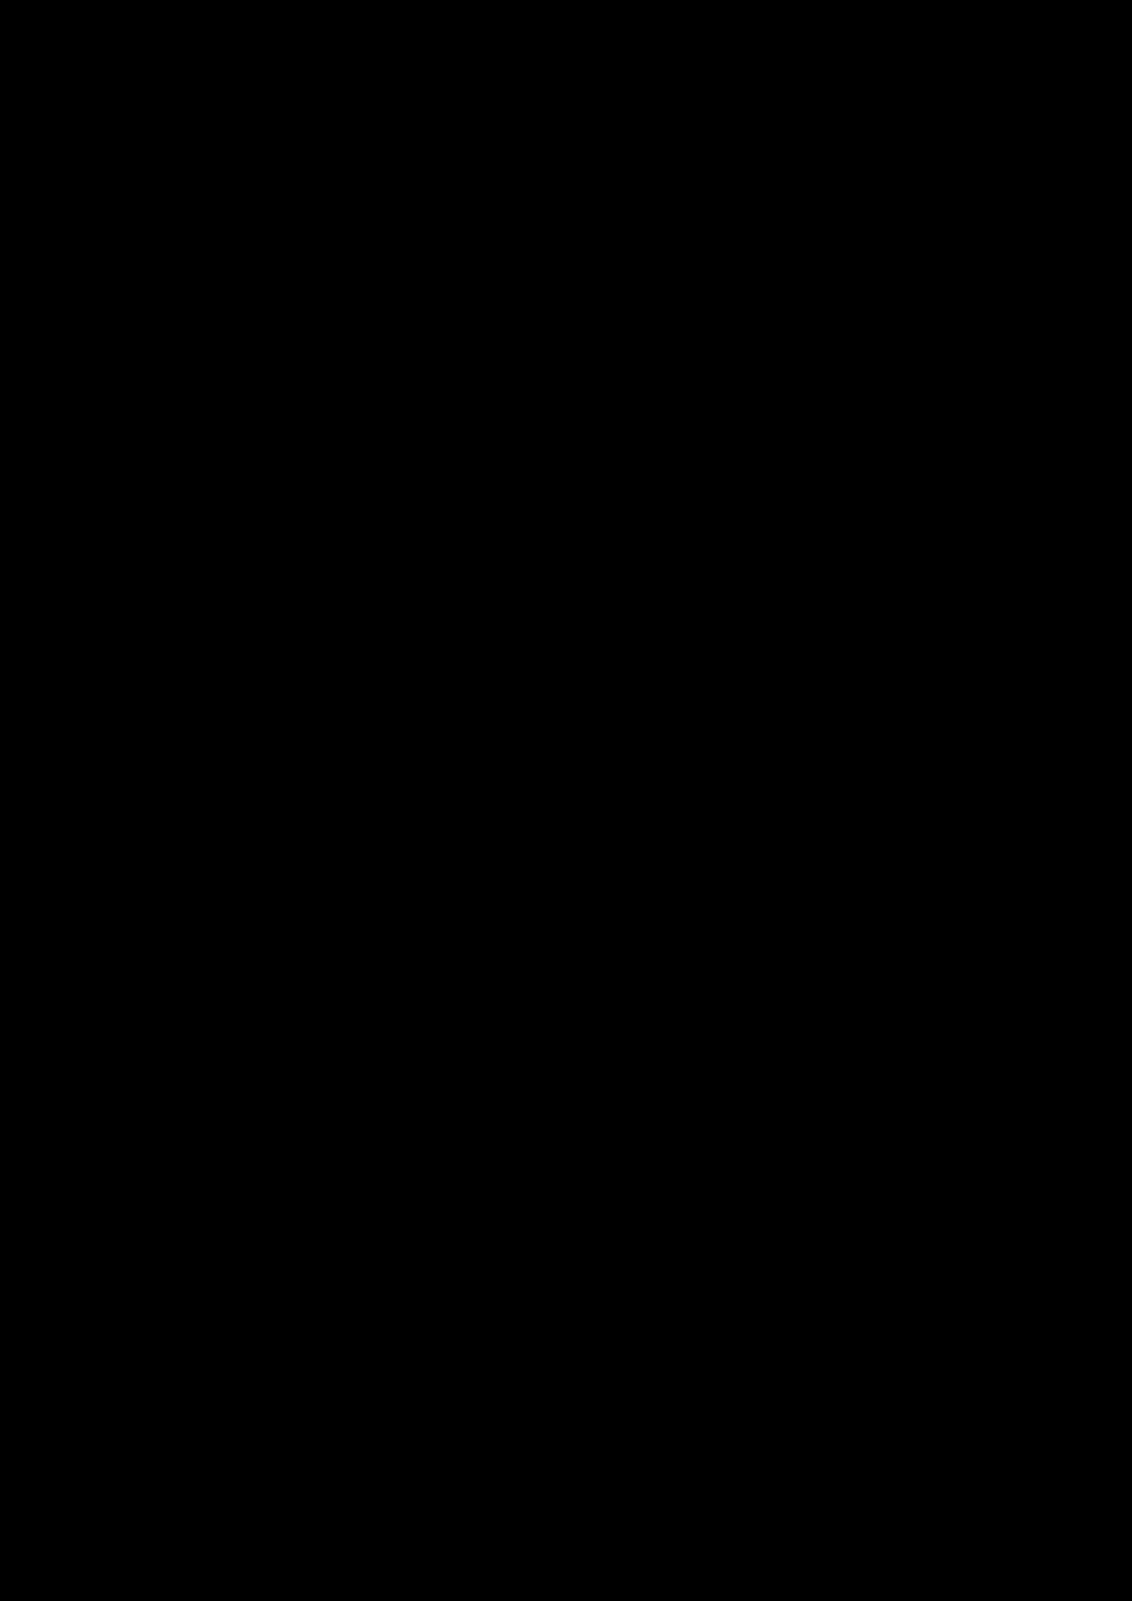 Korolevstvo slez slide, Image 27